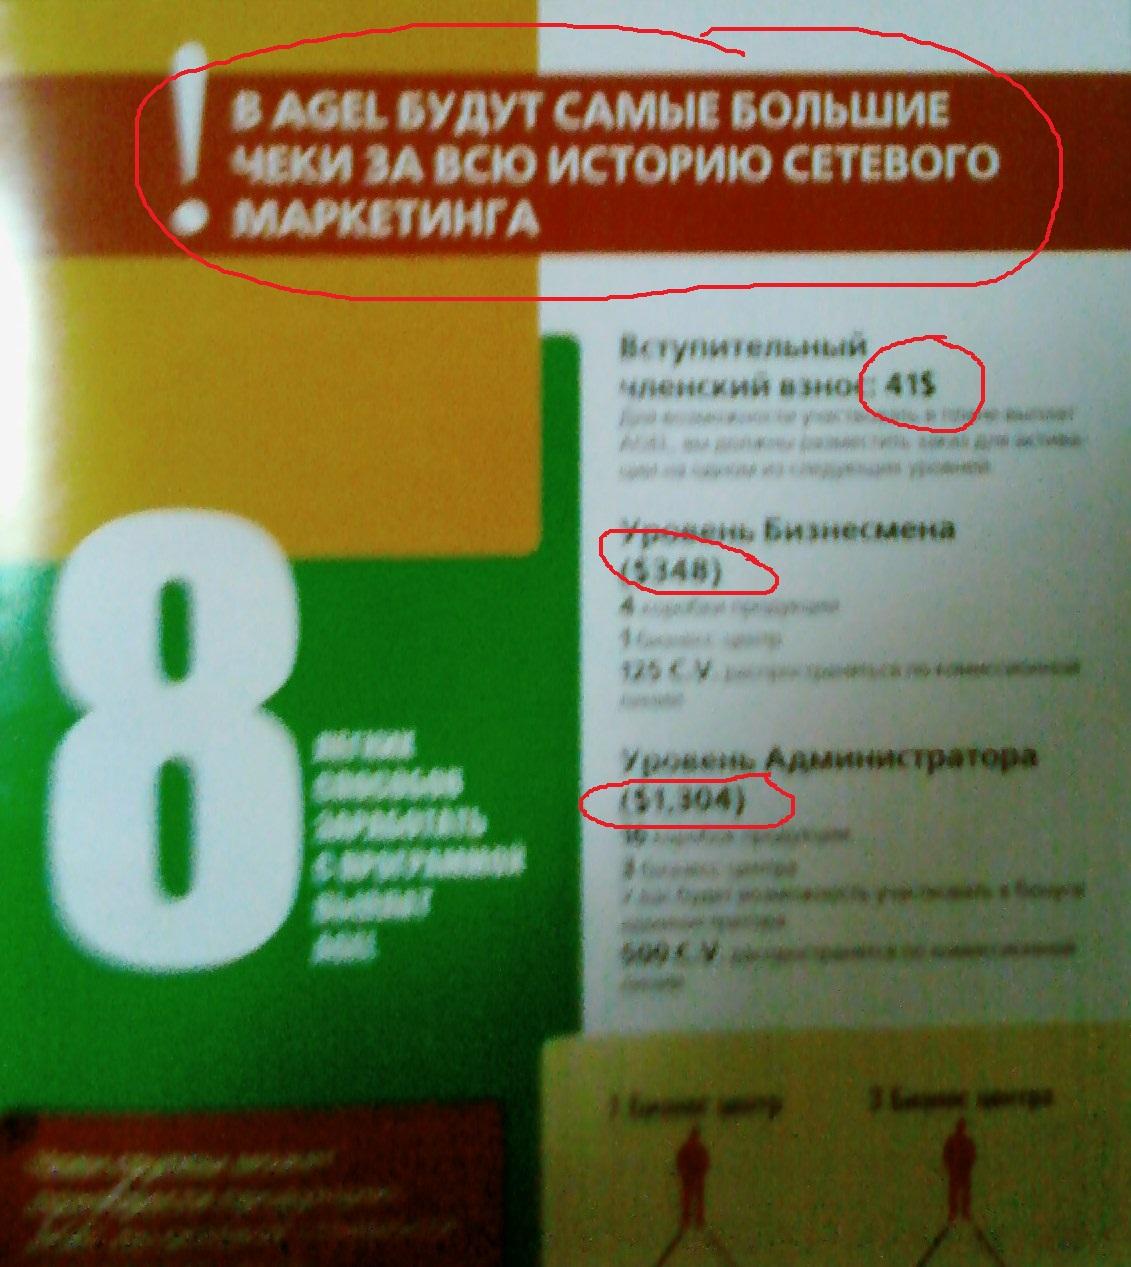 Отзывы о сетевом маркетинге в сети newpro ucoz реклама google